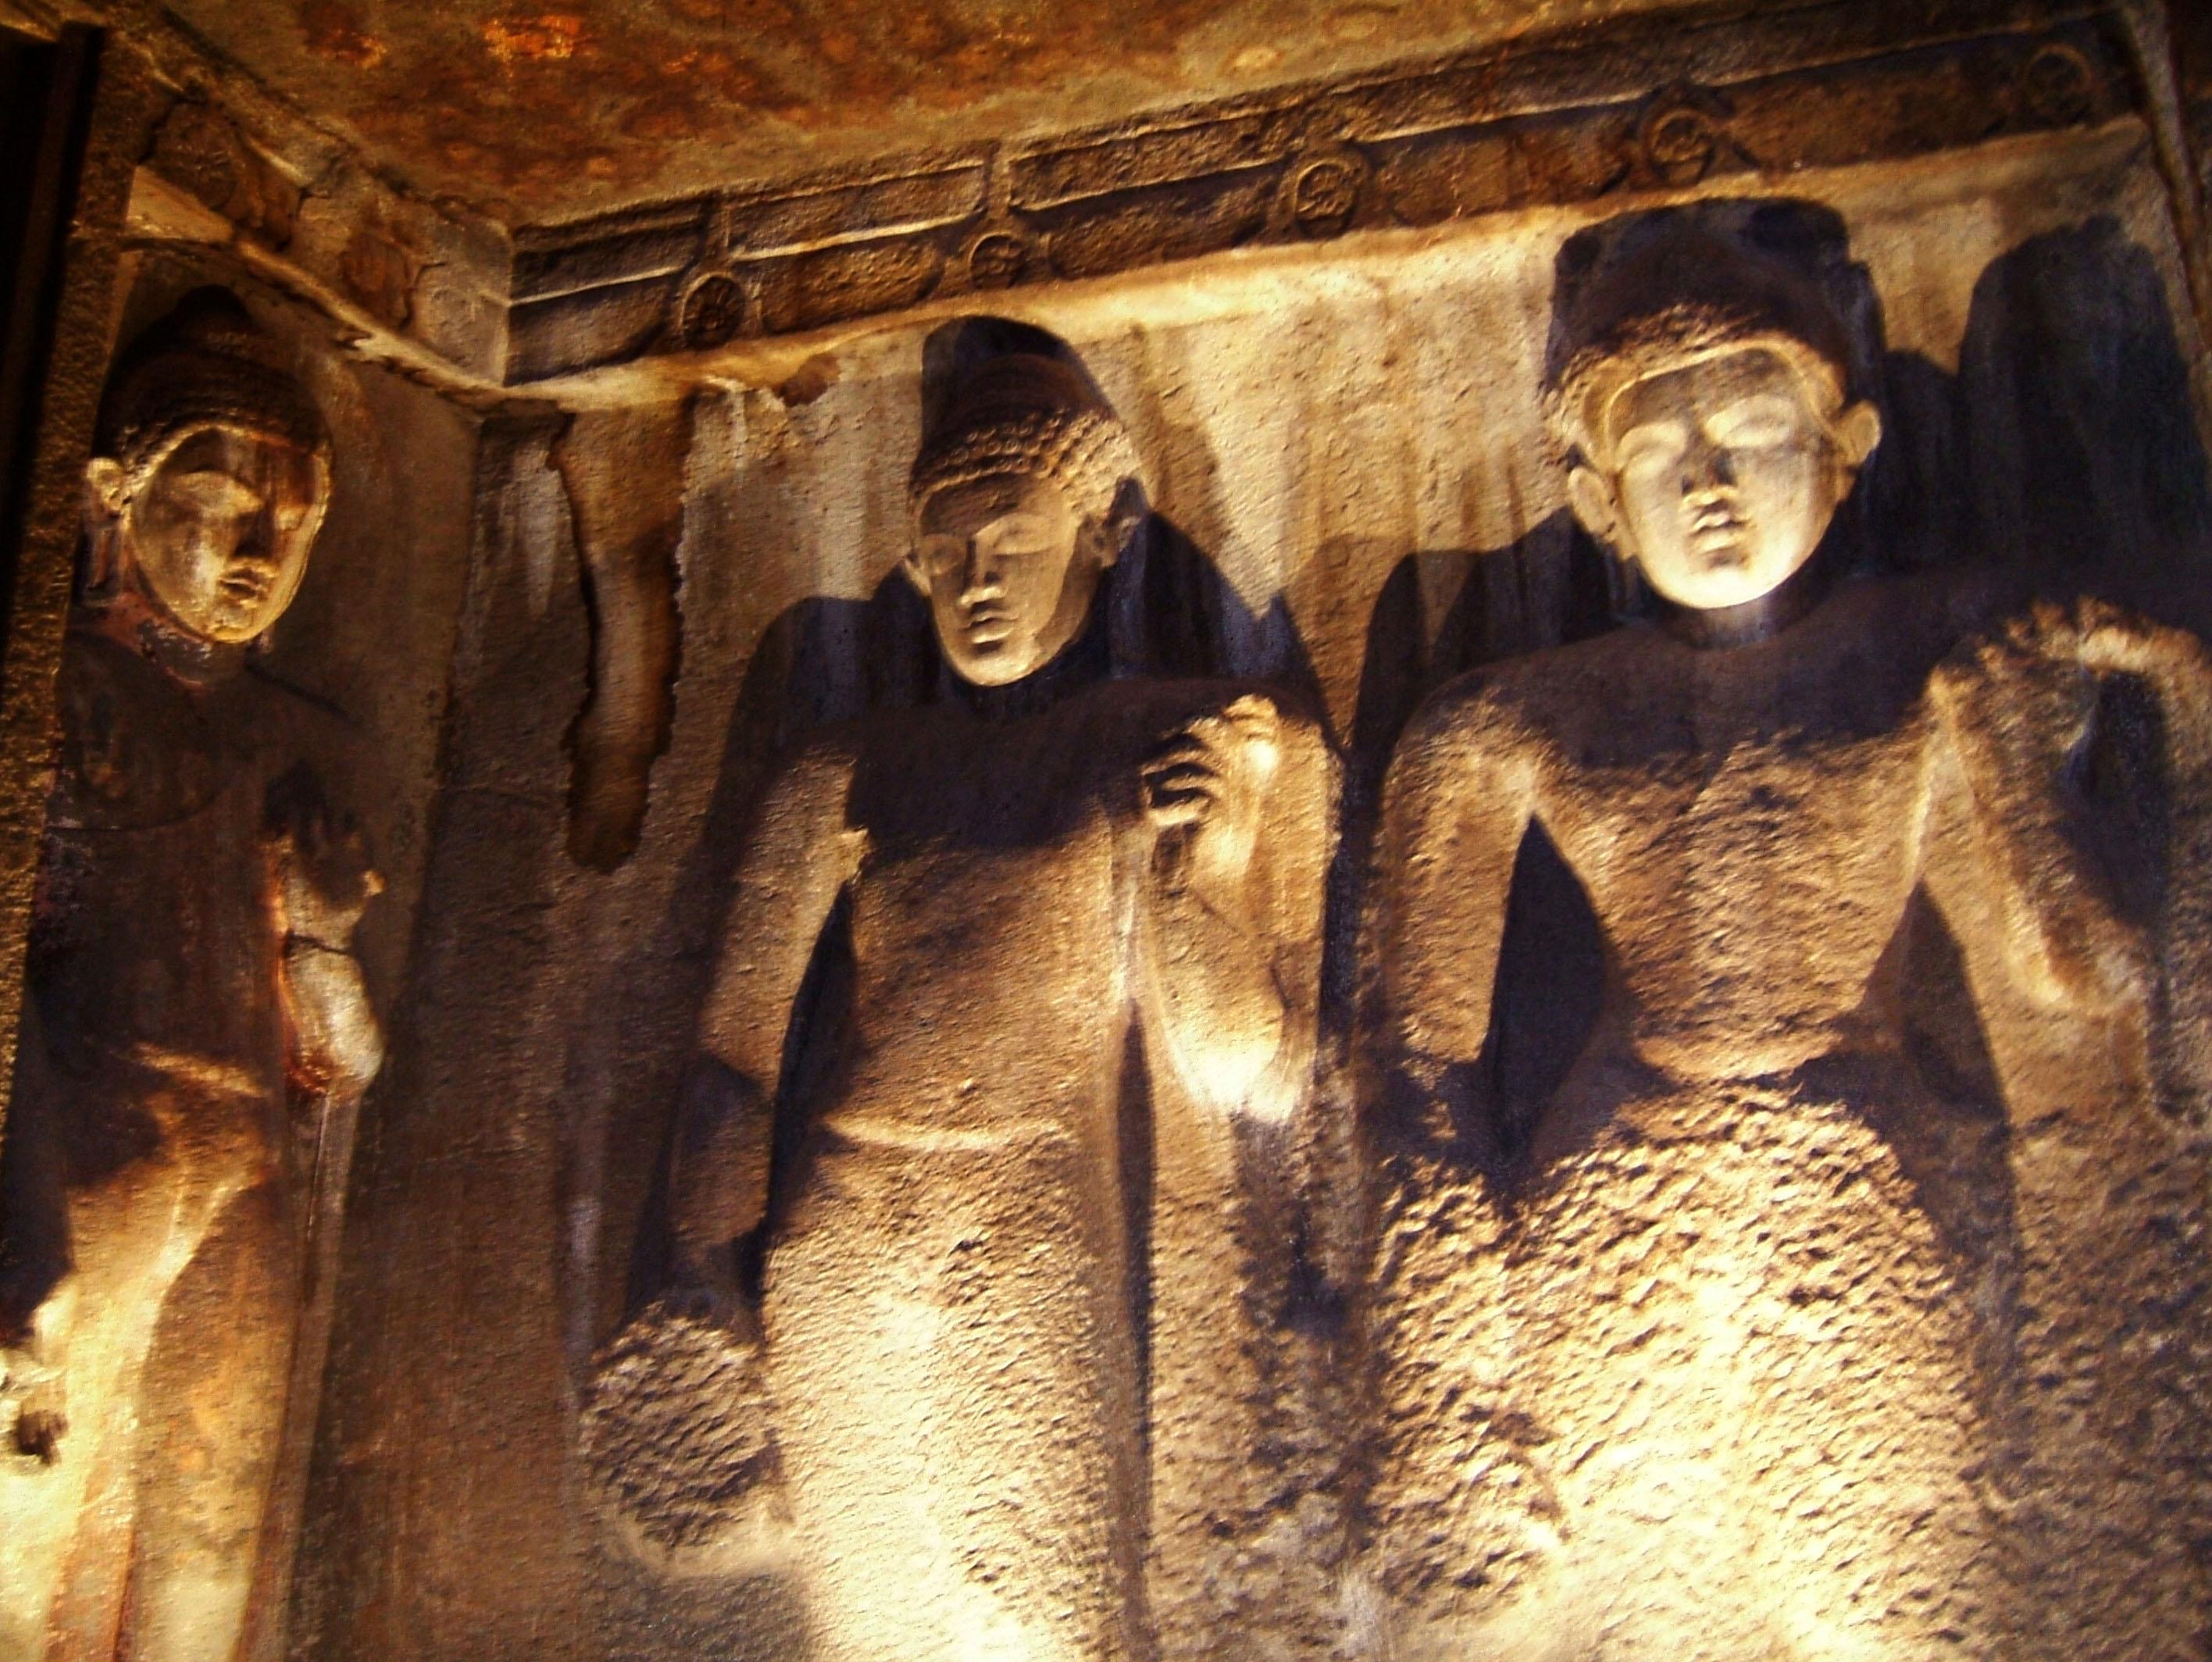 Marathwada Ajanta Caves Buddha carvings India Apr 2004 01